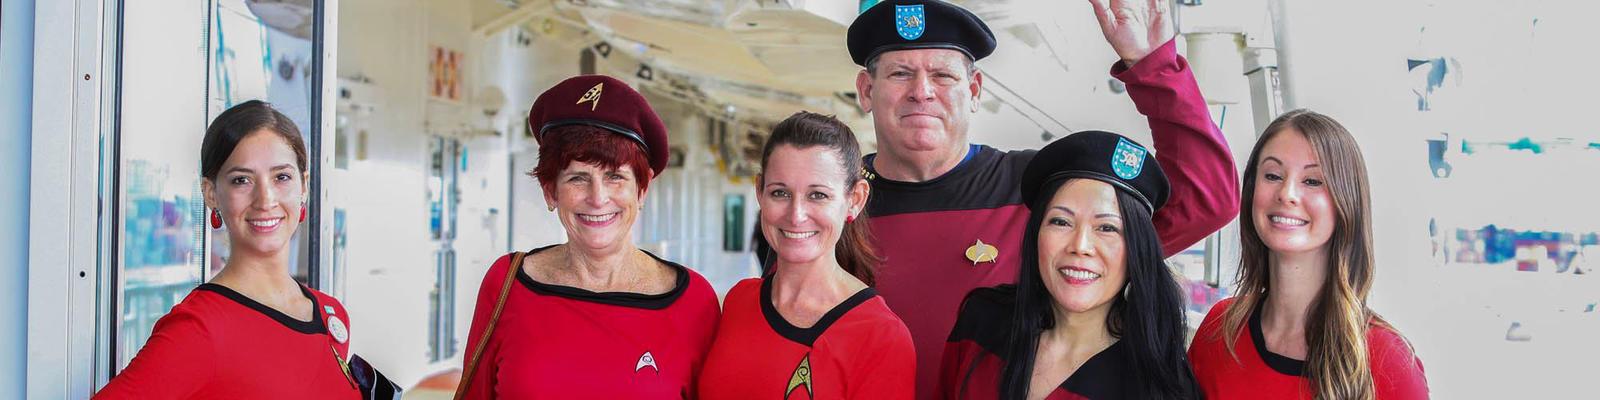 Cosplayers on the Star Trek Cruise (Photo: startrekthecruise.com)